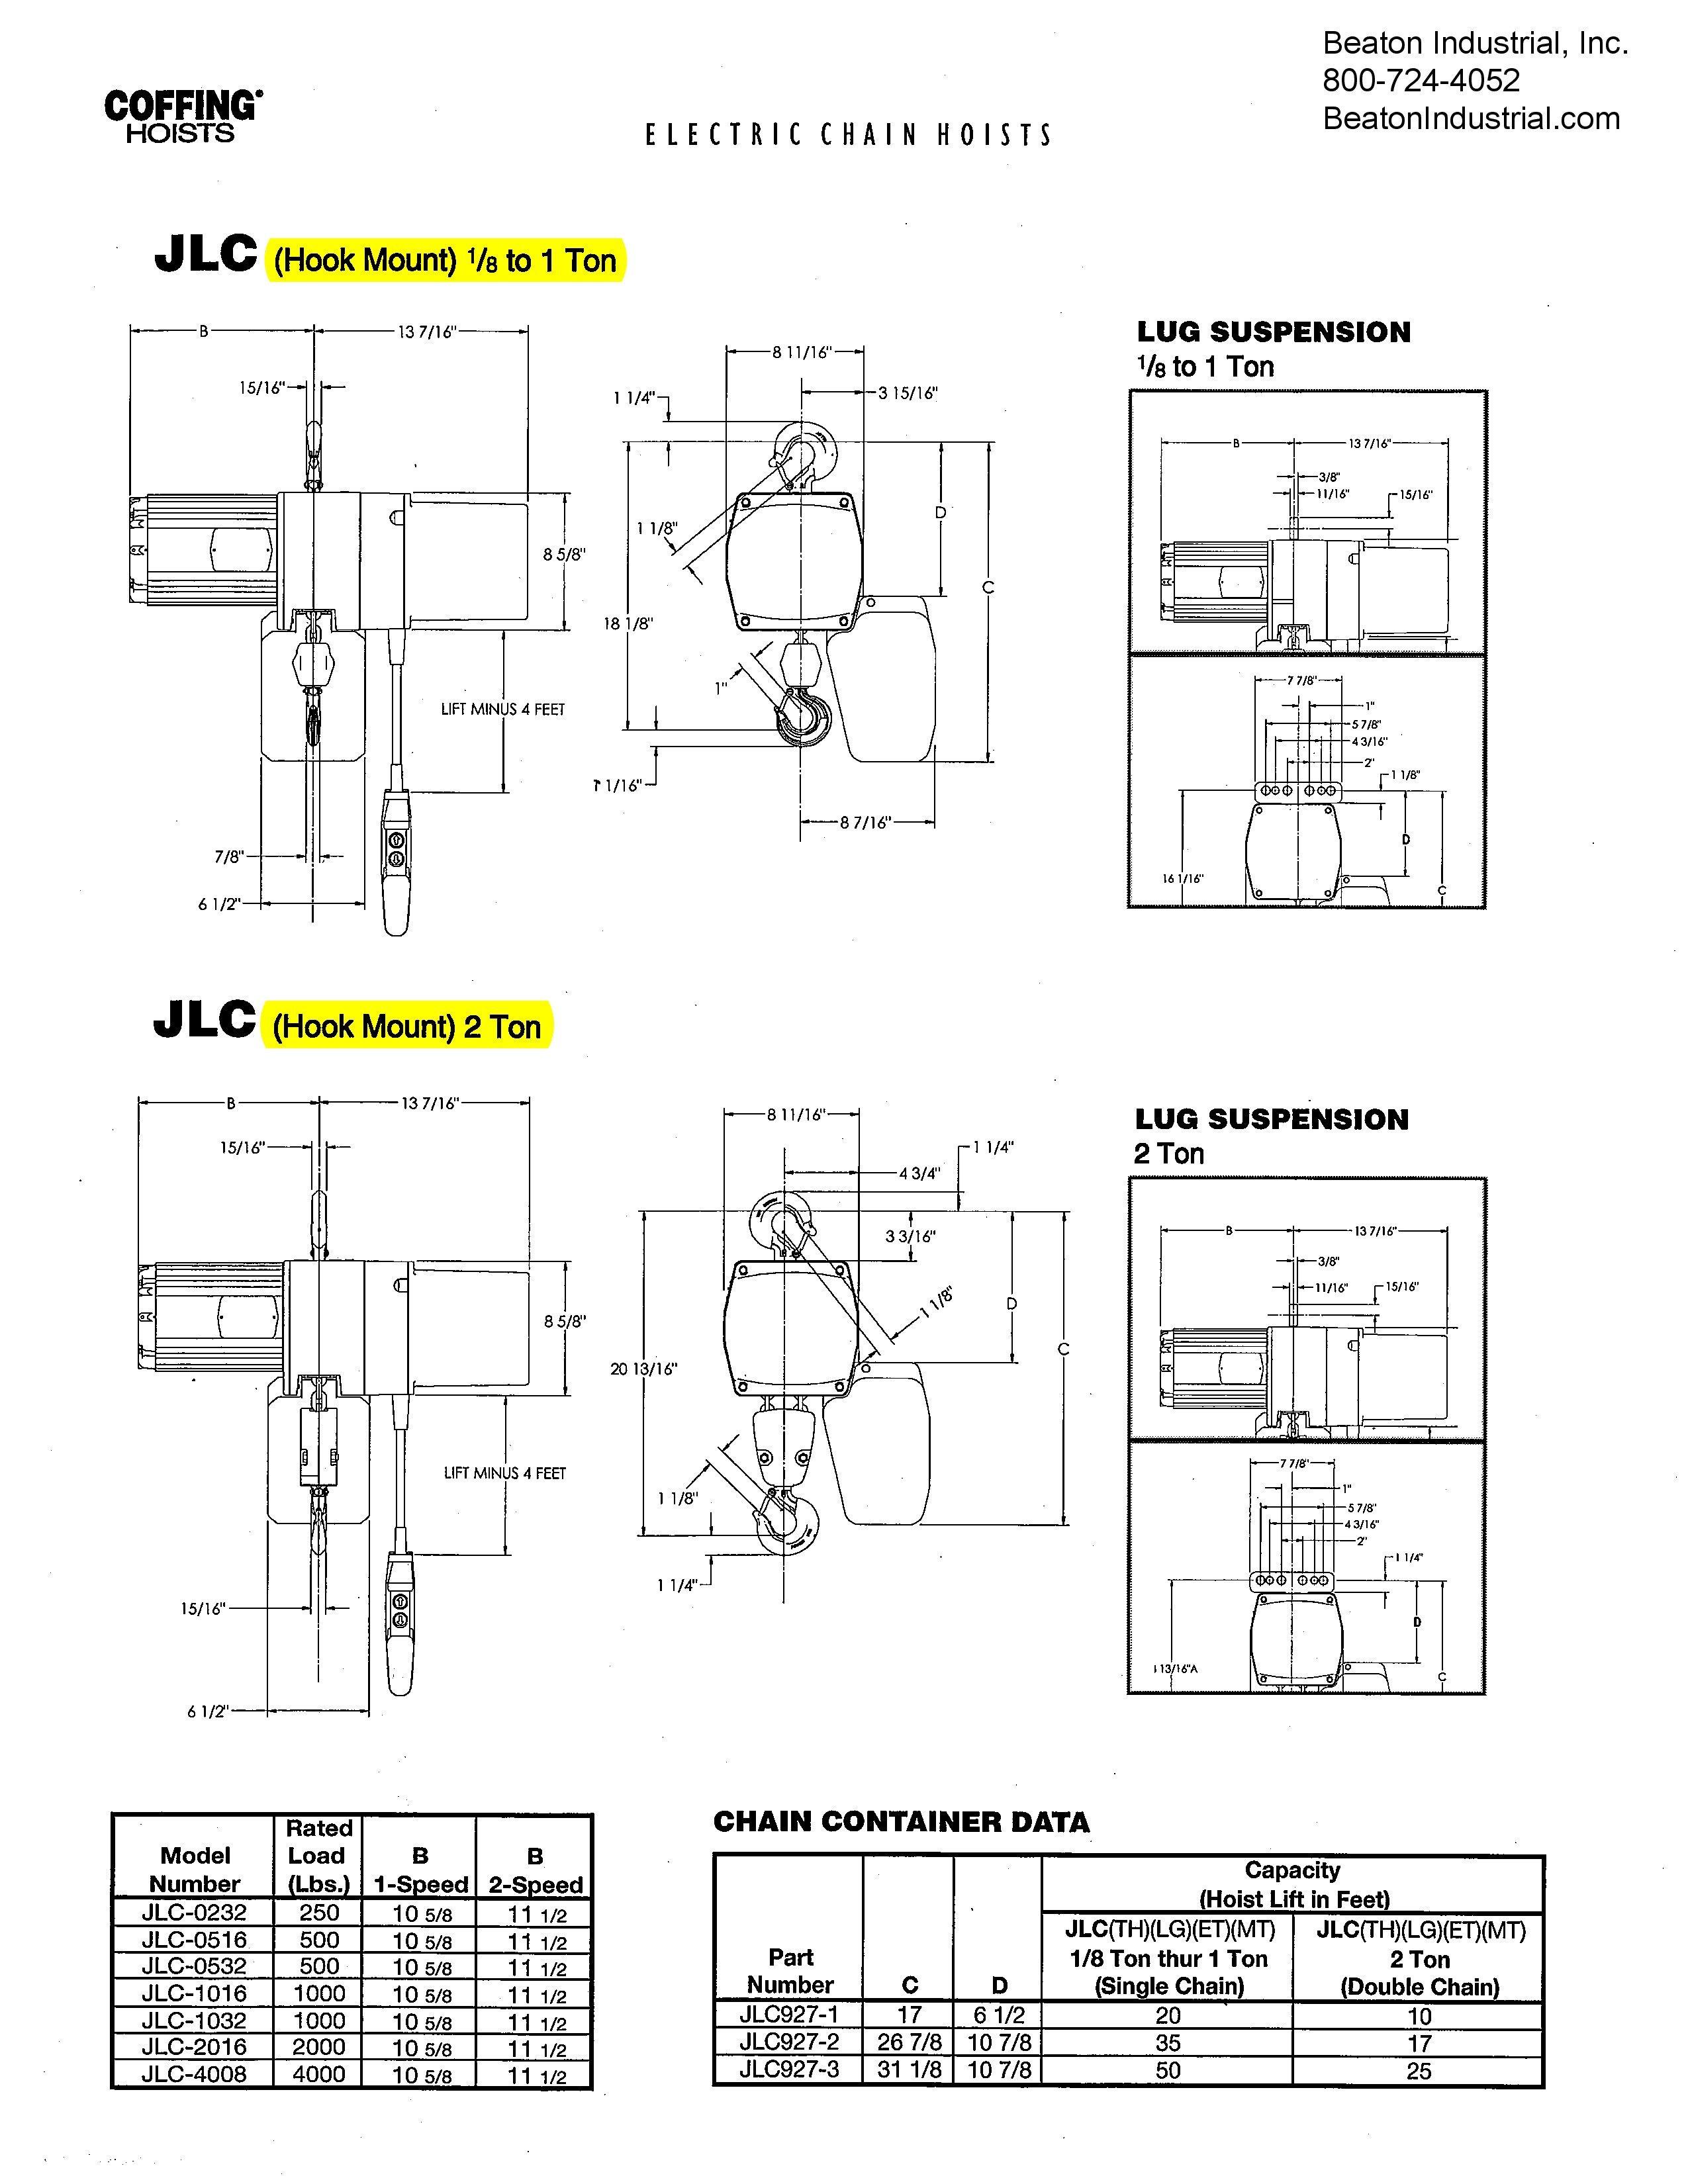 Kx 4077  Coffing Hoist Wiring Diagram Free Diagram